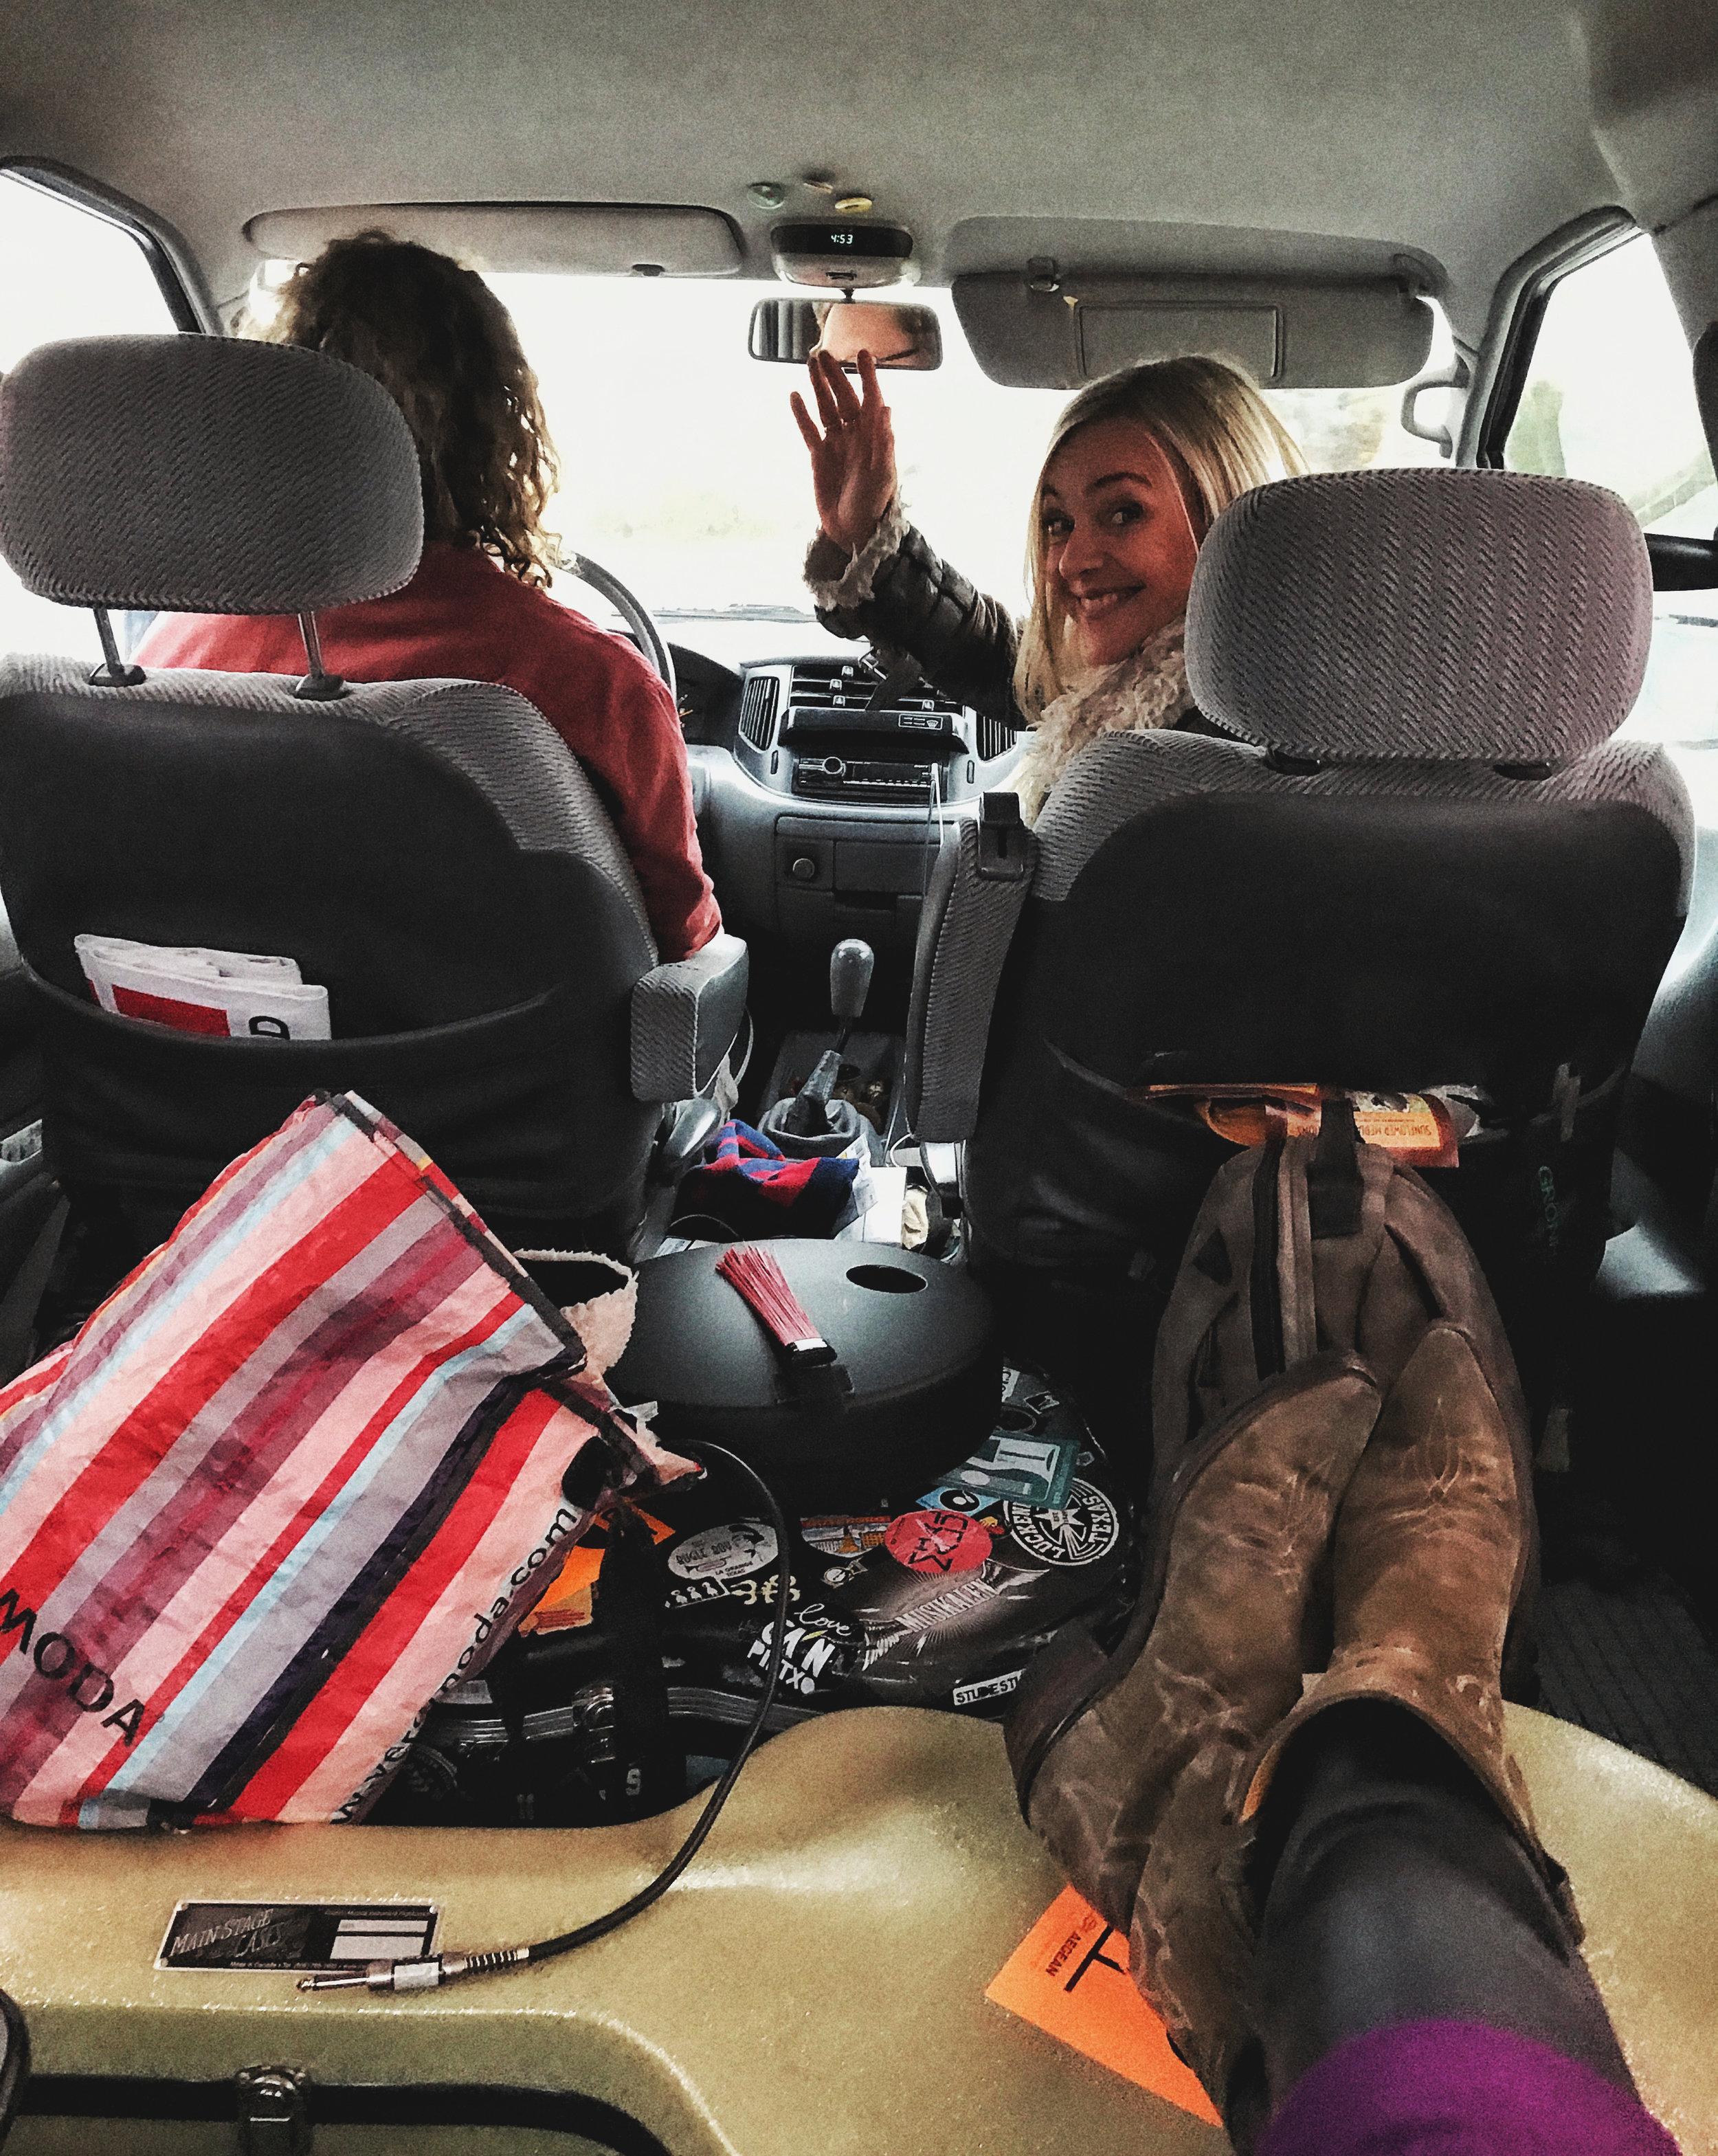 The Swedish Tour Van